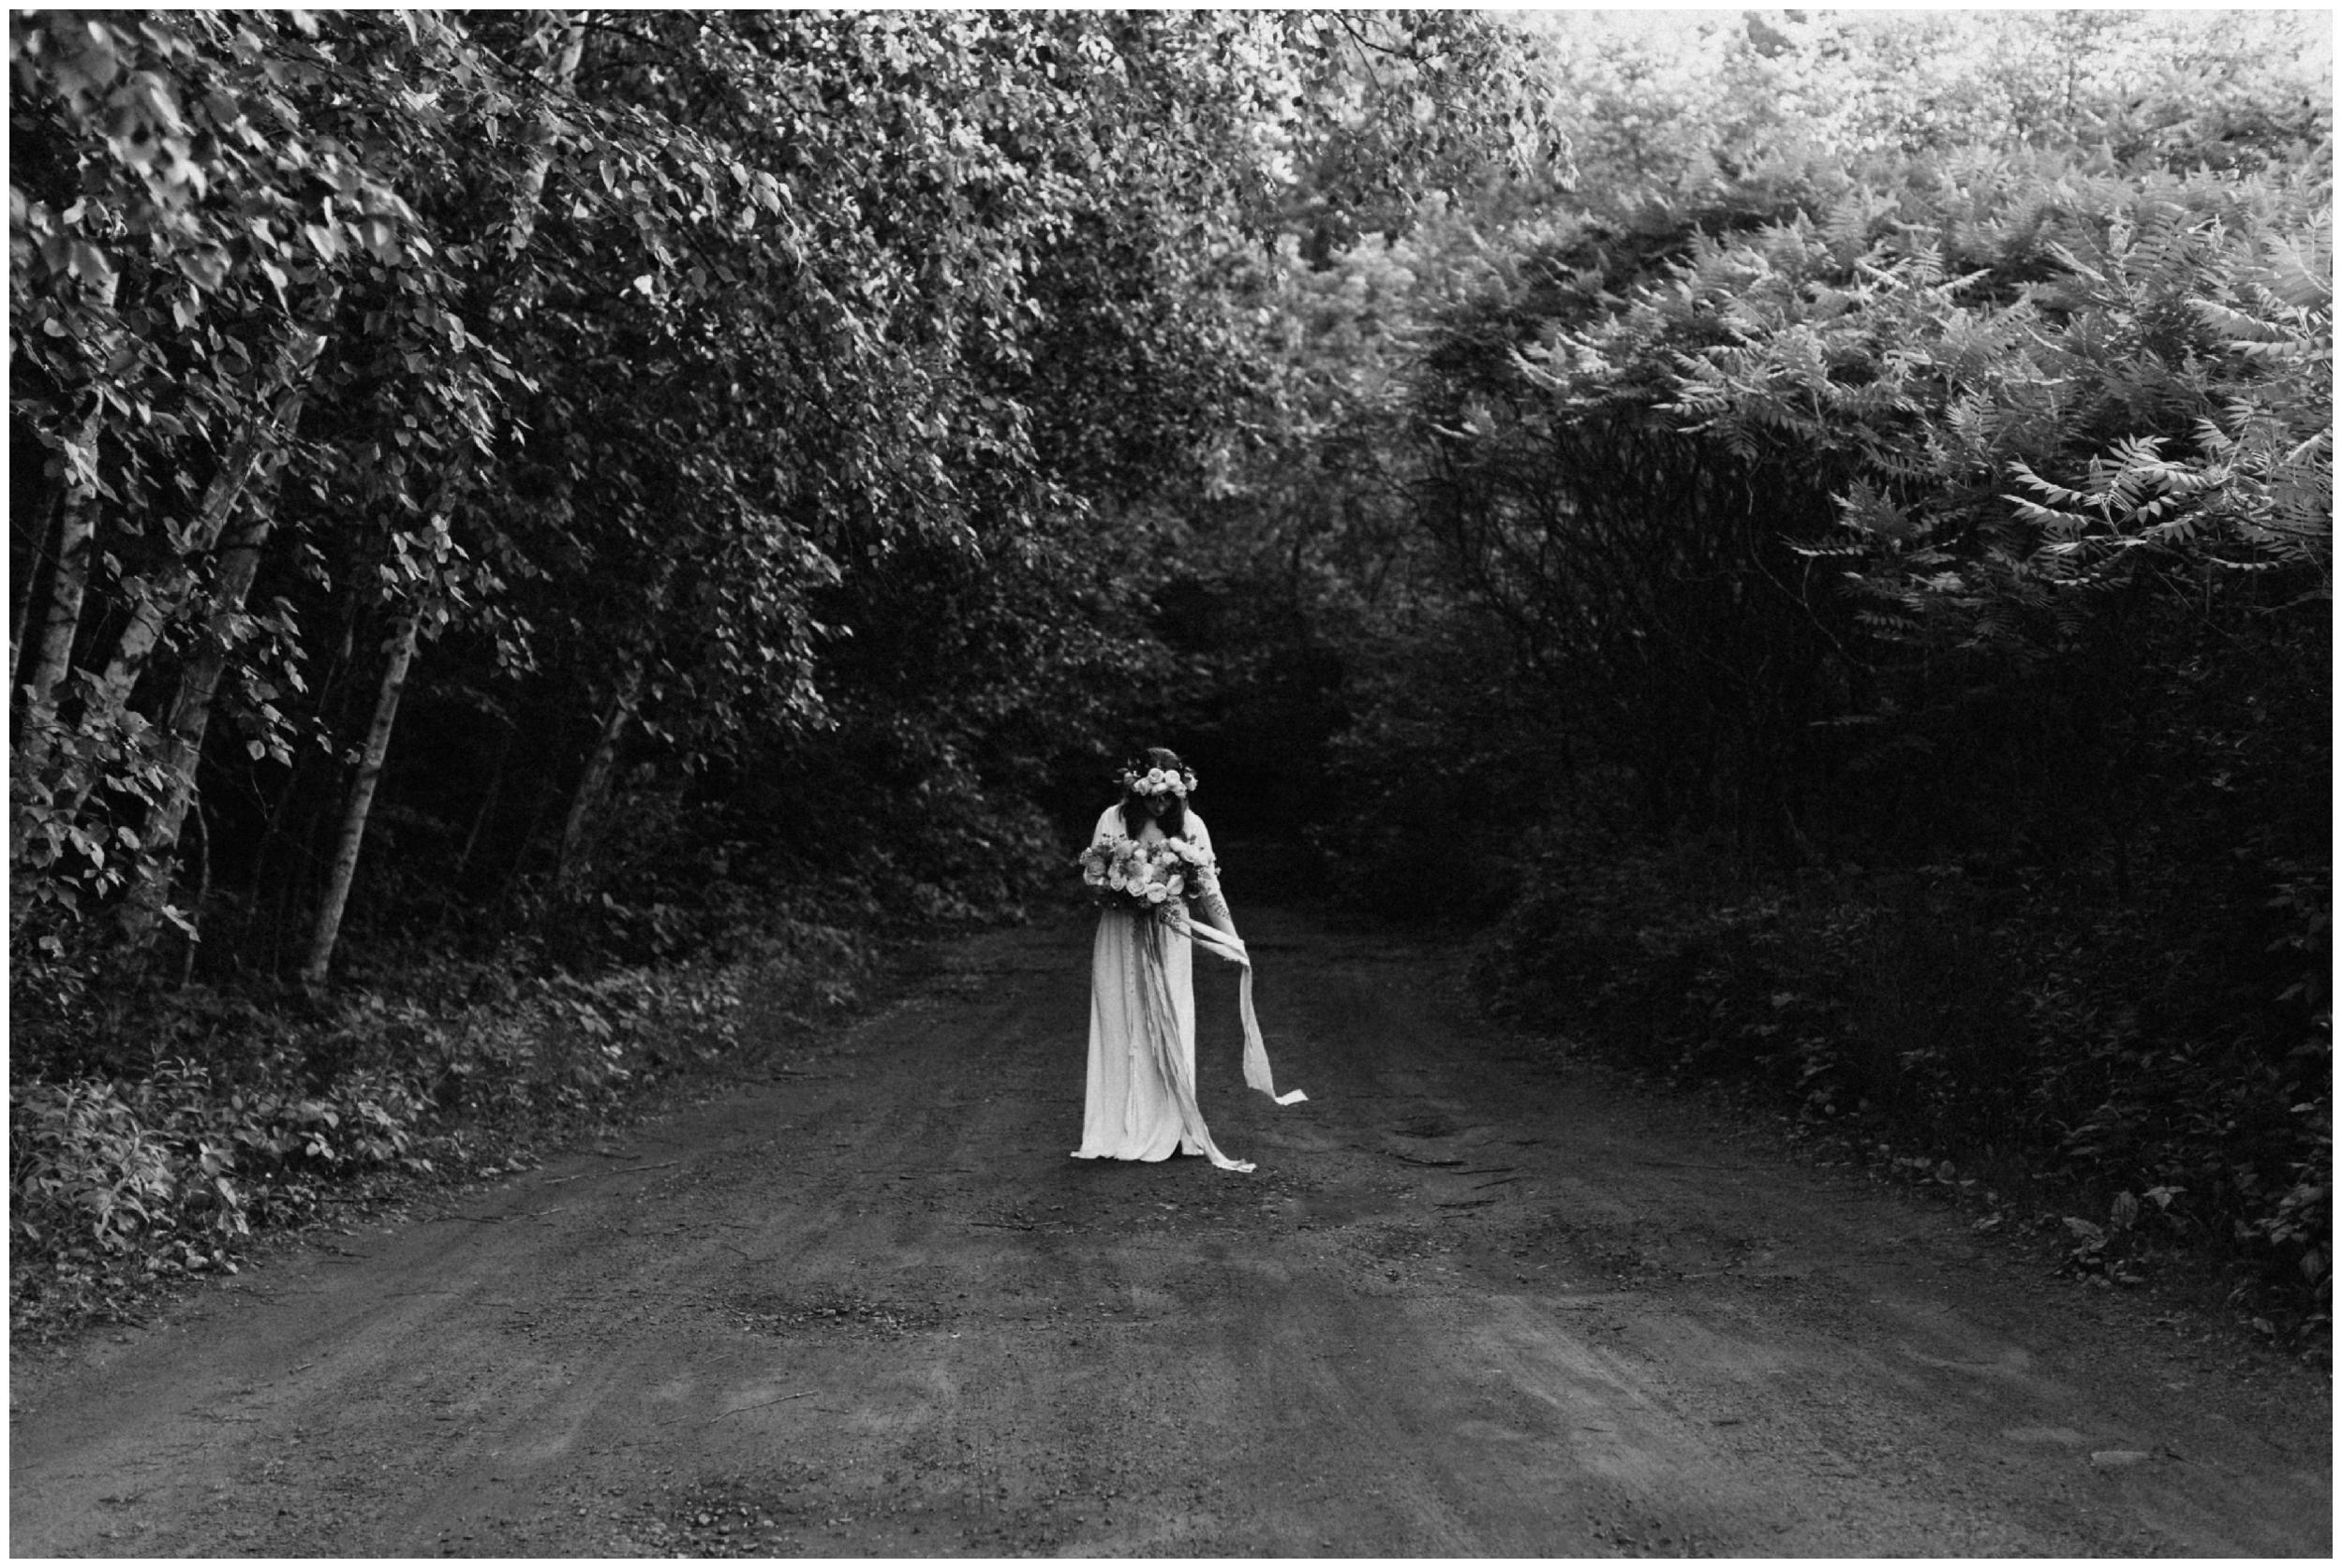 Boho wedding in the woods by Brainerd Minnesota photographer Britt DeZeeuw